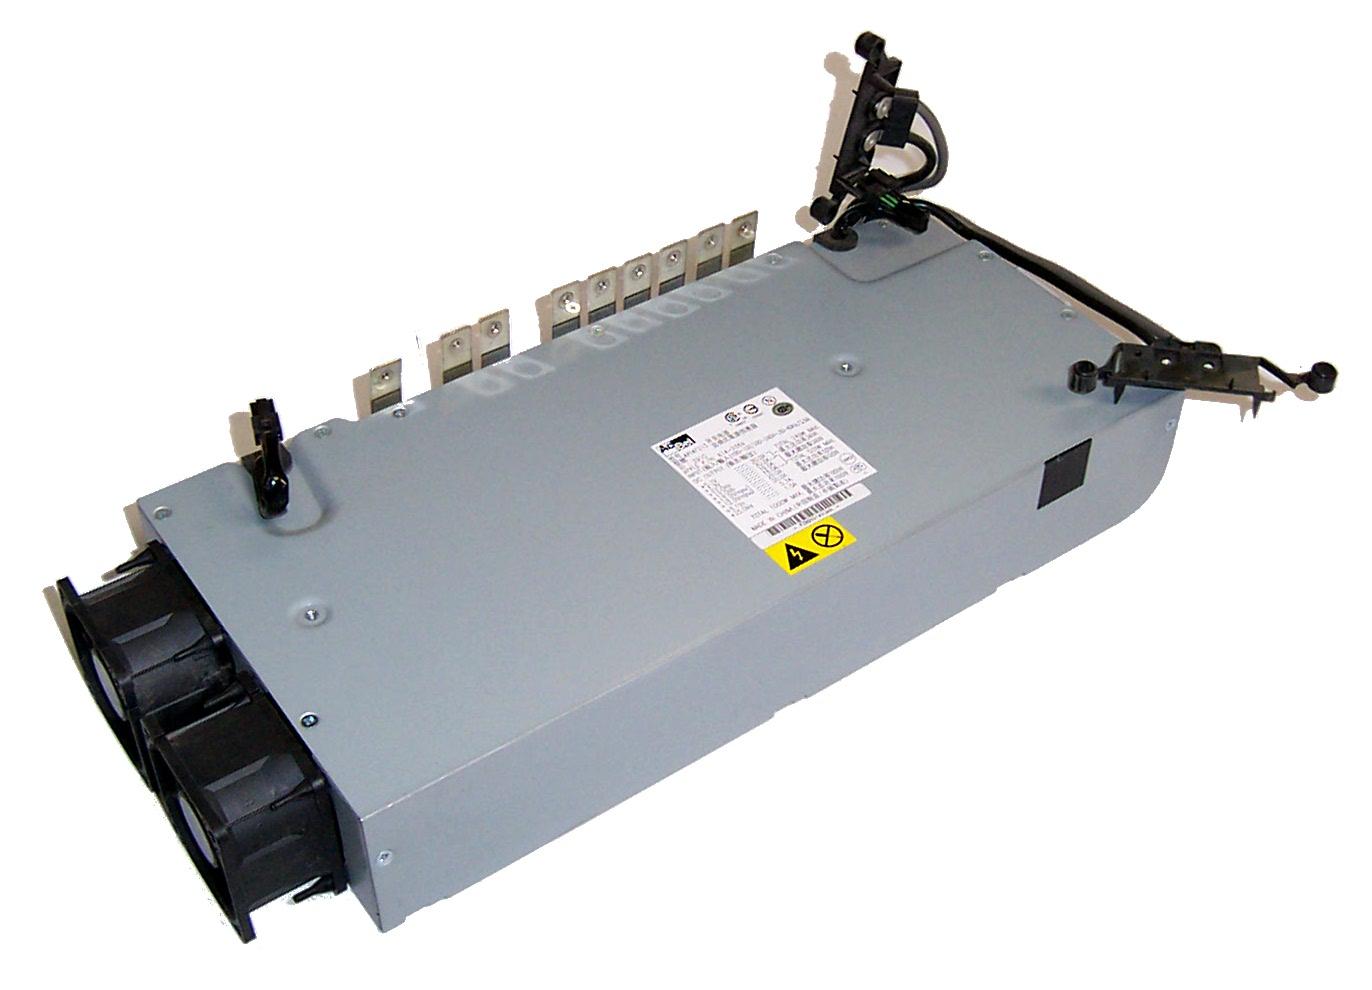 Apple 614-0384 Power Mac G5 1000W Max Power Supply- AcBel Model: API4FS13